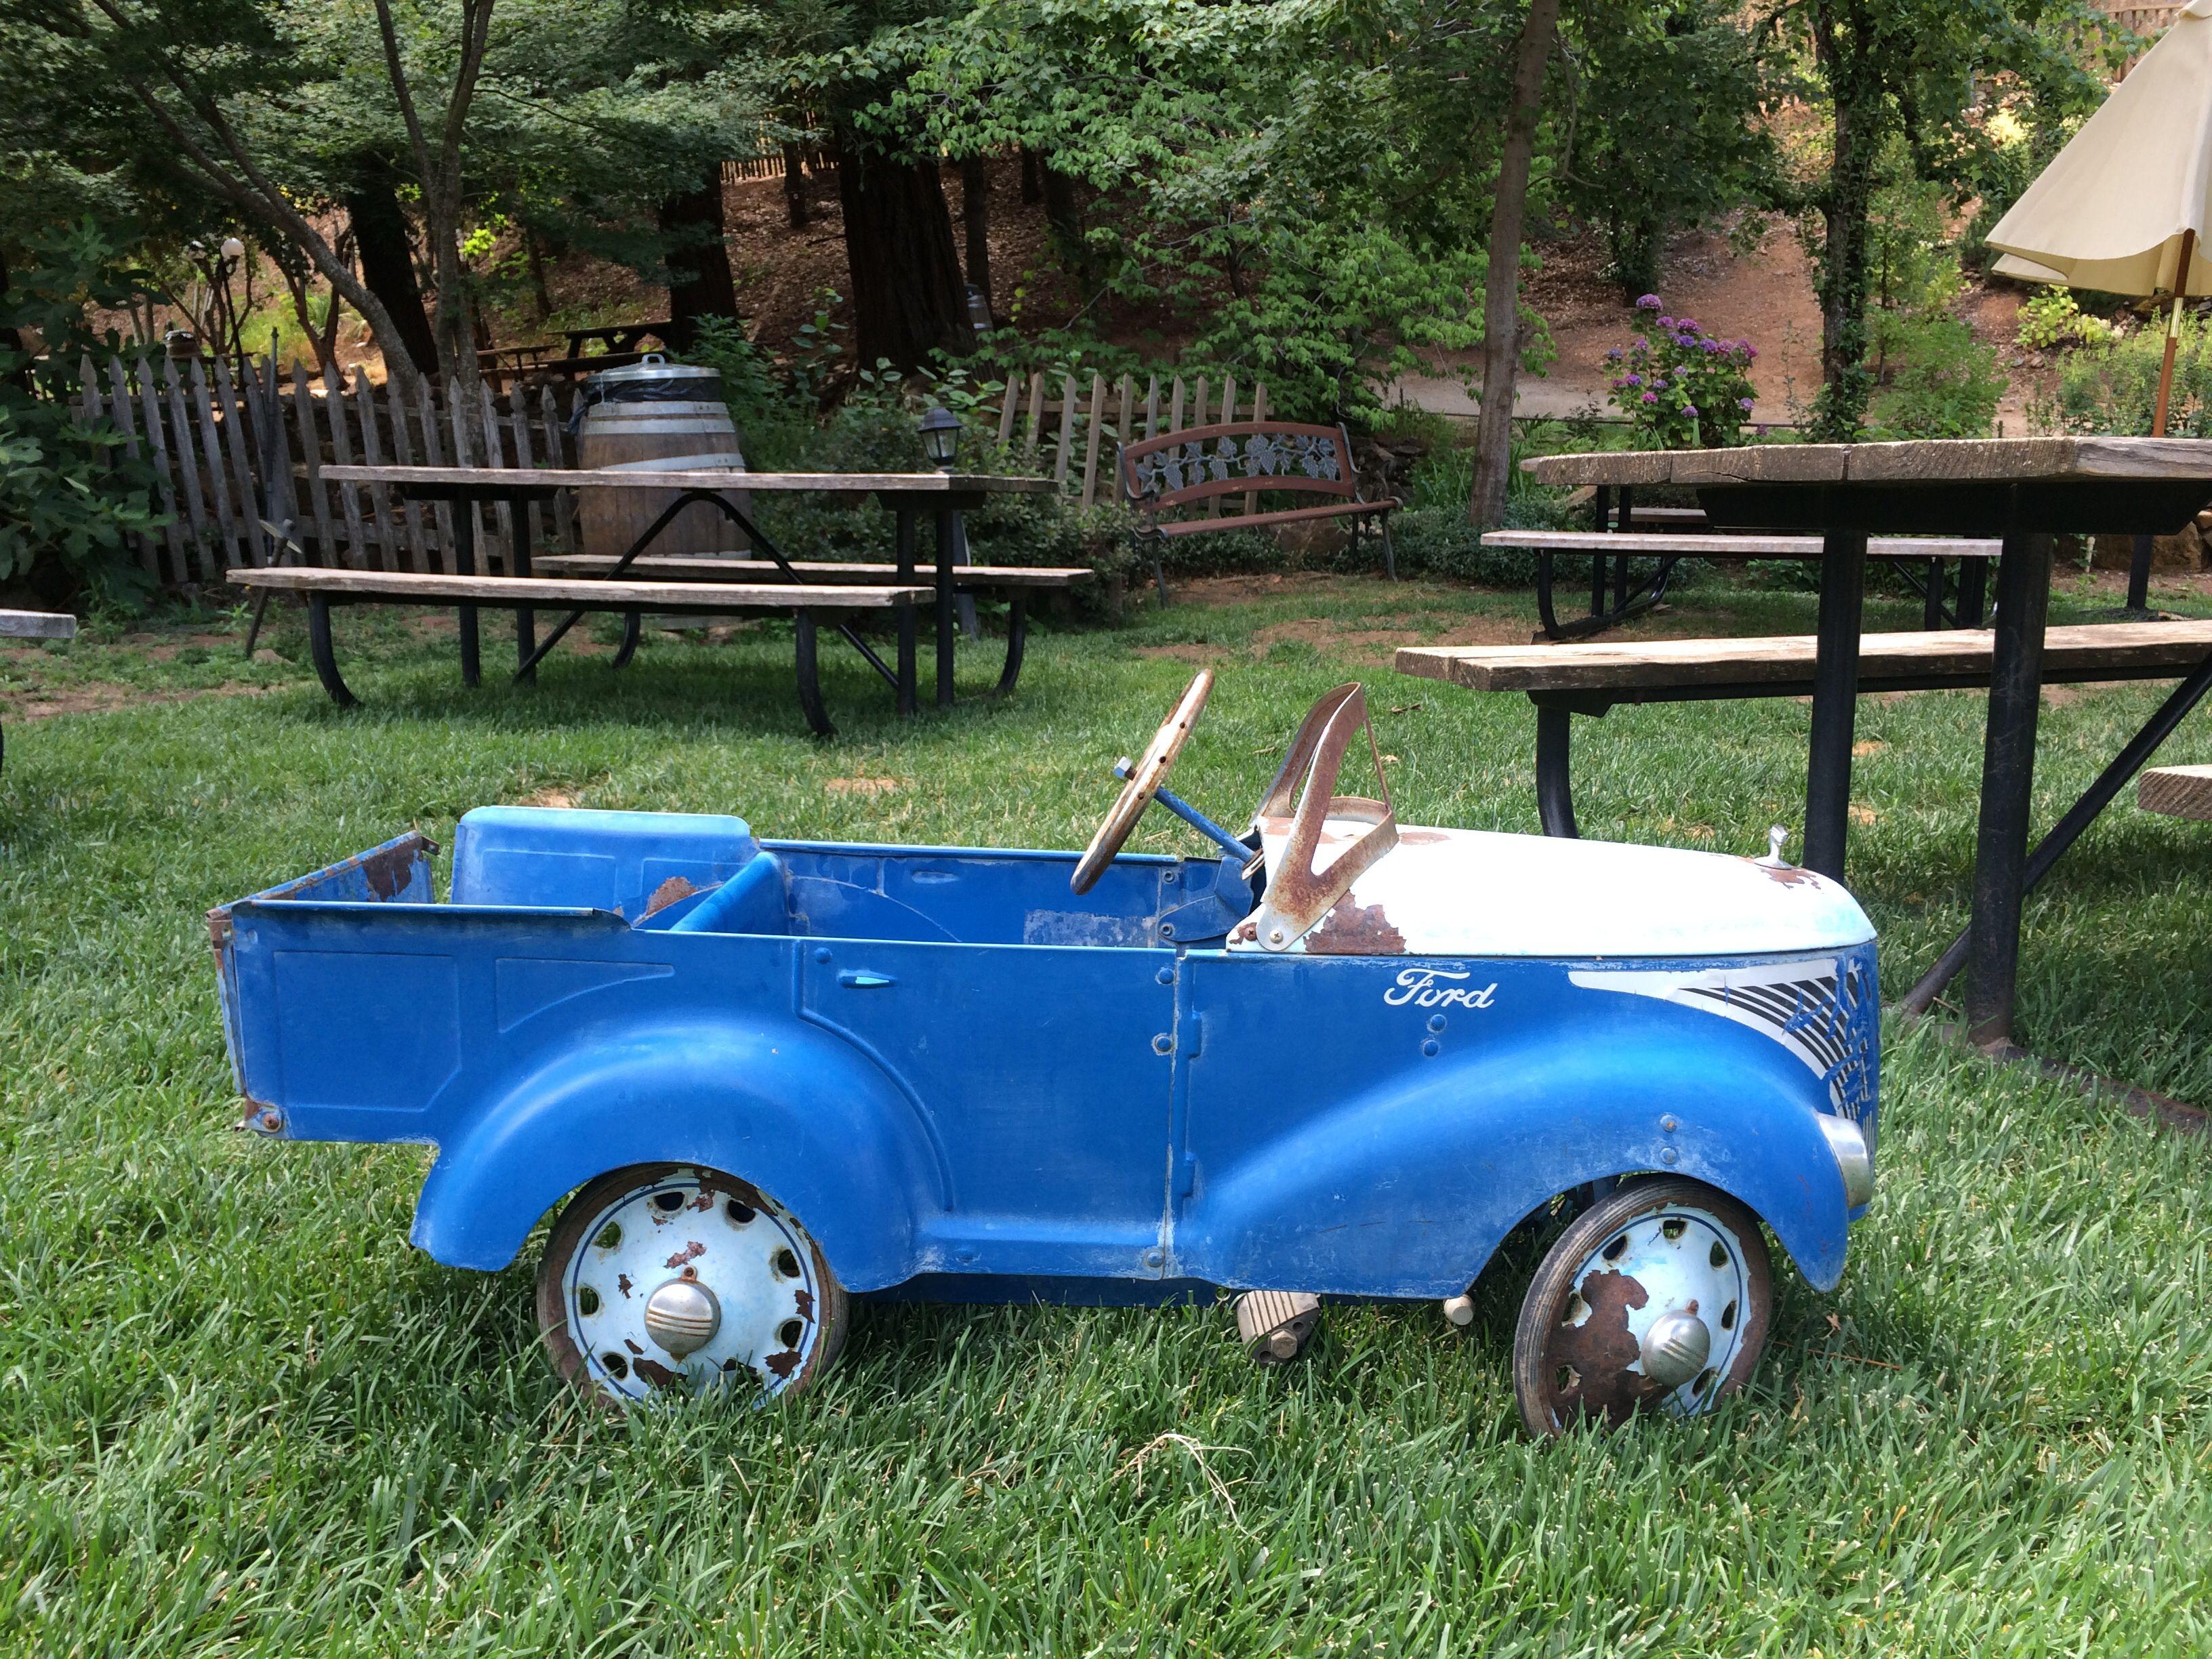 Love My Old Pedal Car Pedal Cars Vintage Pedal Cars Car